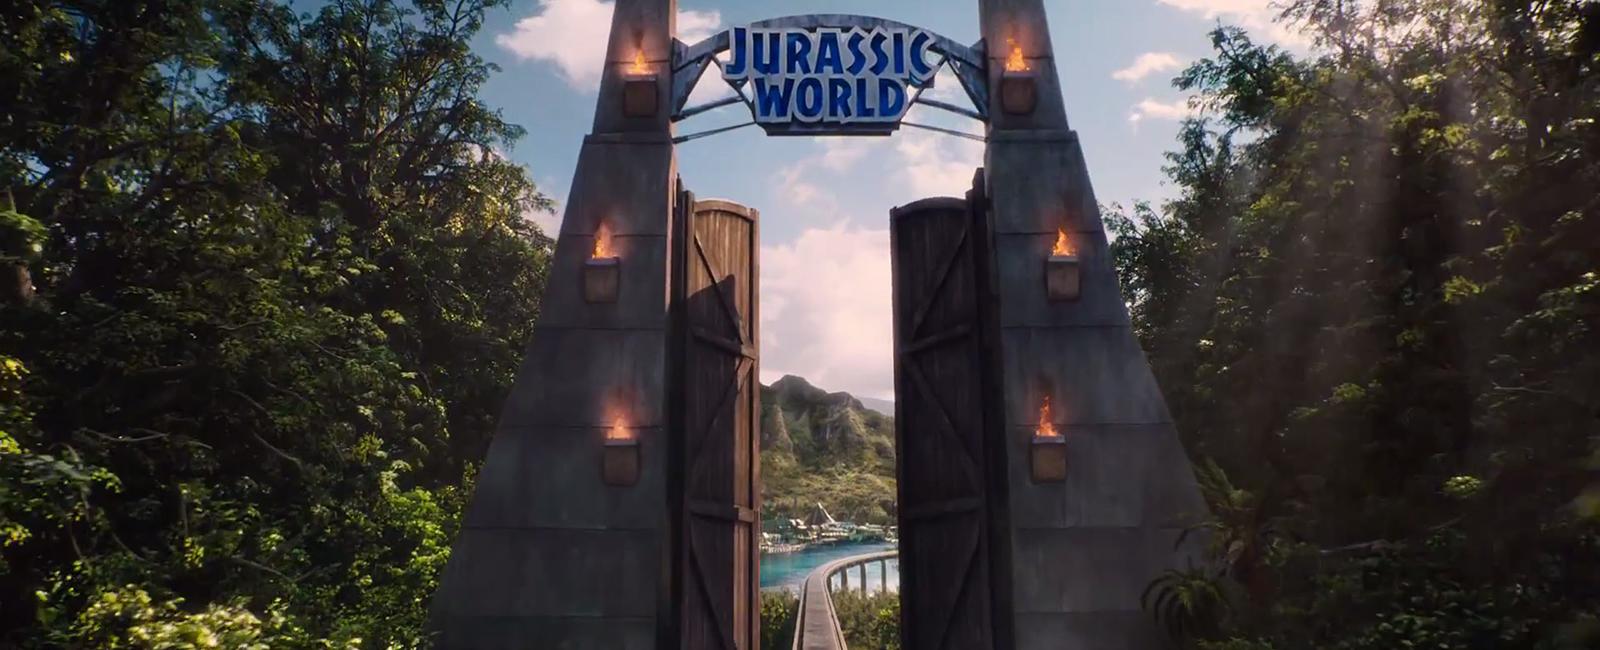 Jurassic World – First Trailer